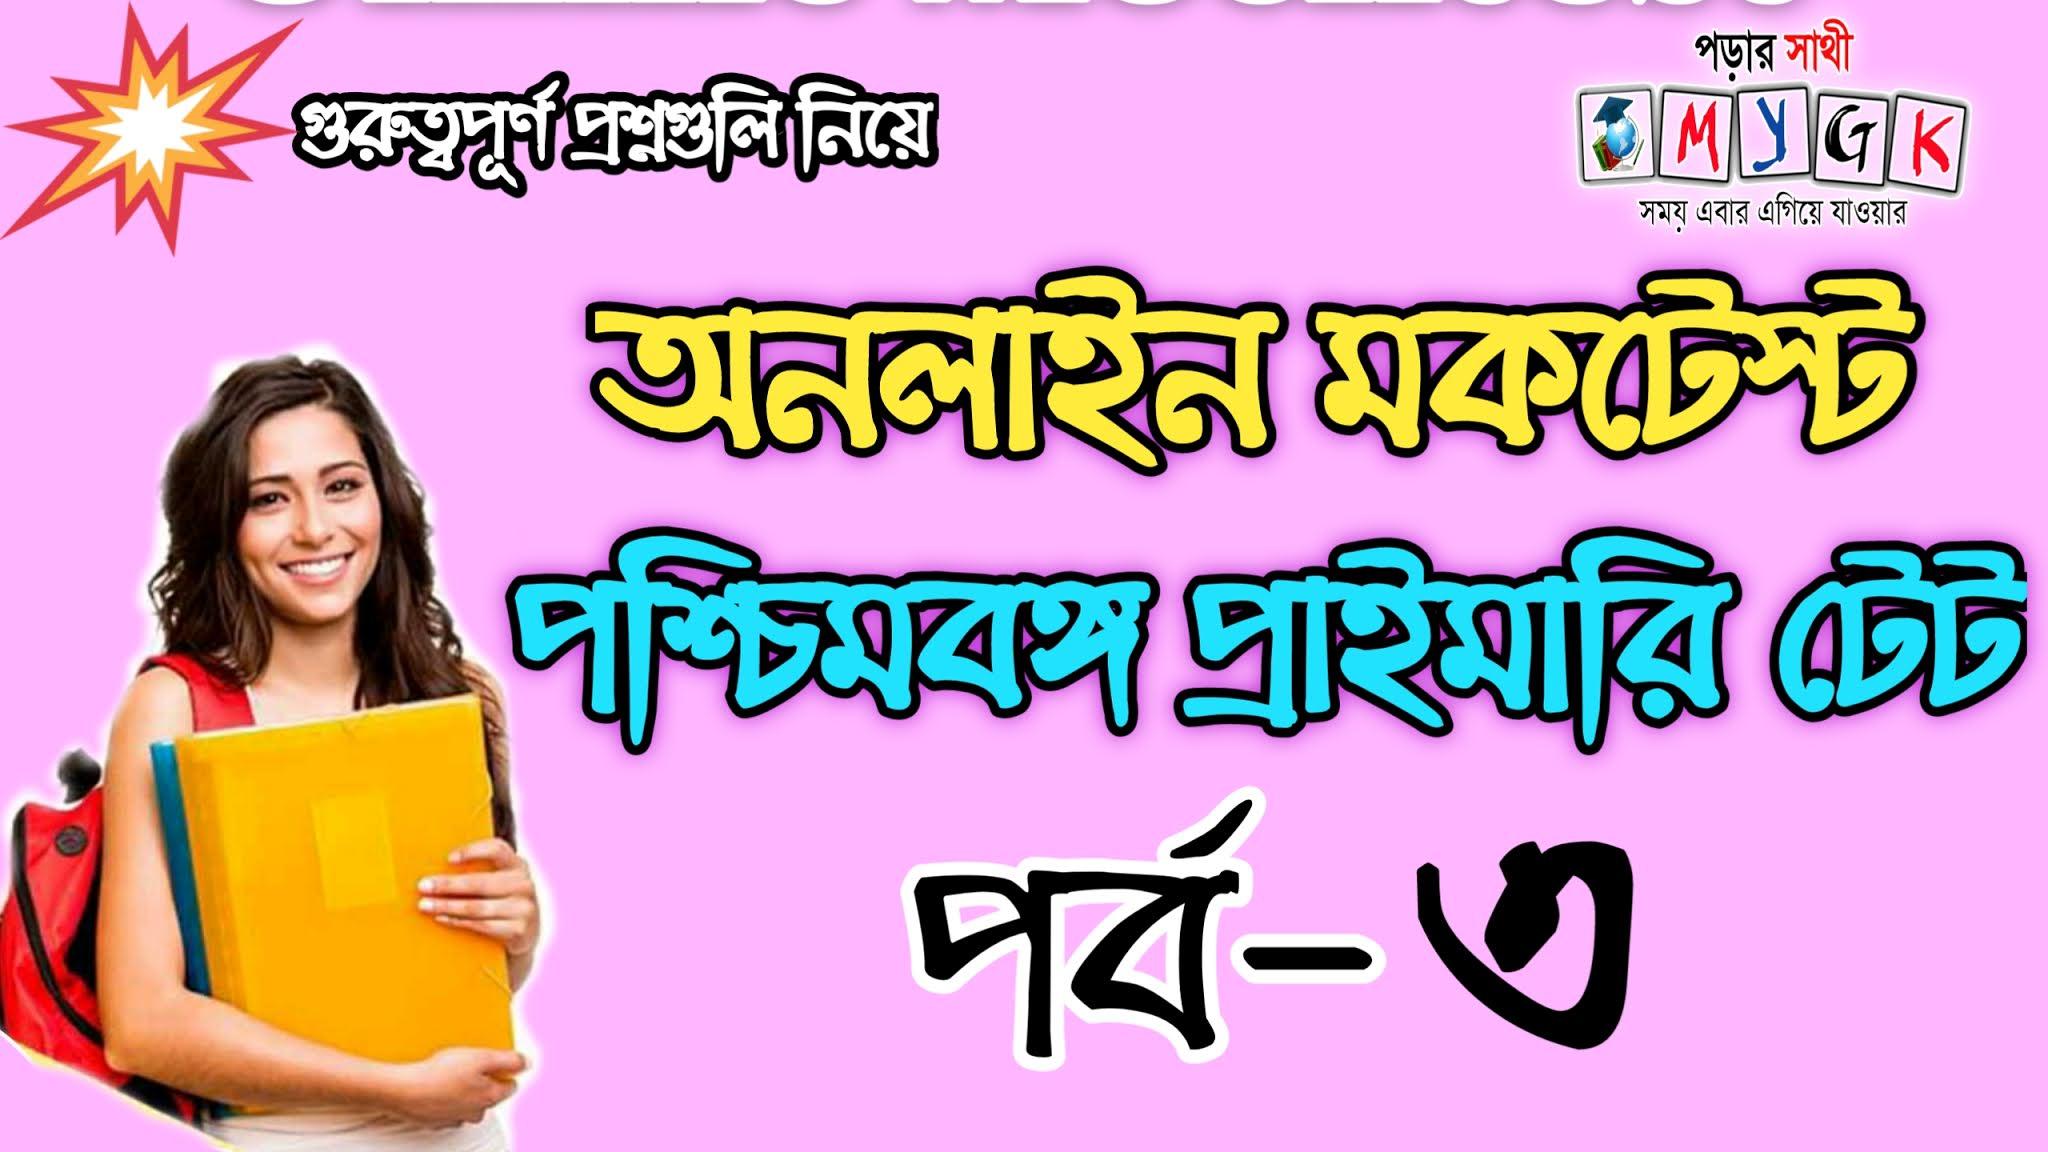 WB Primary TET Online Mocktest in Bengali (Part-3) - Tet/C-TET - প্রাইমারি টেট  অনলাইন মকটেস্ট